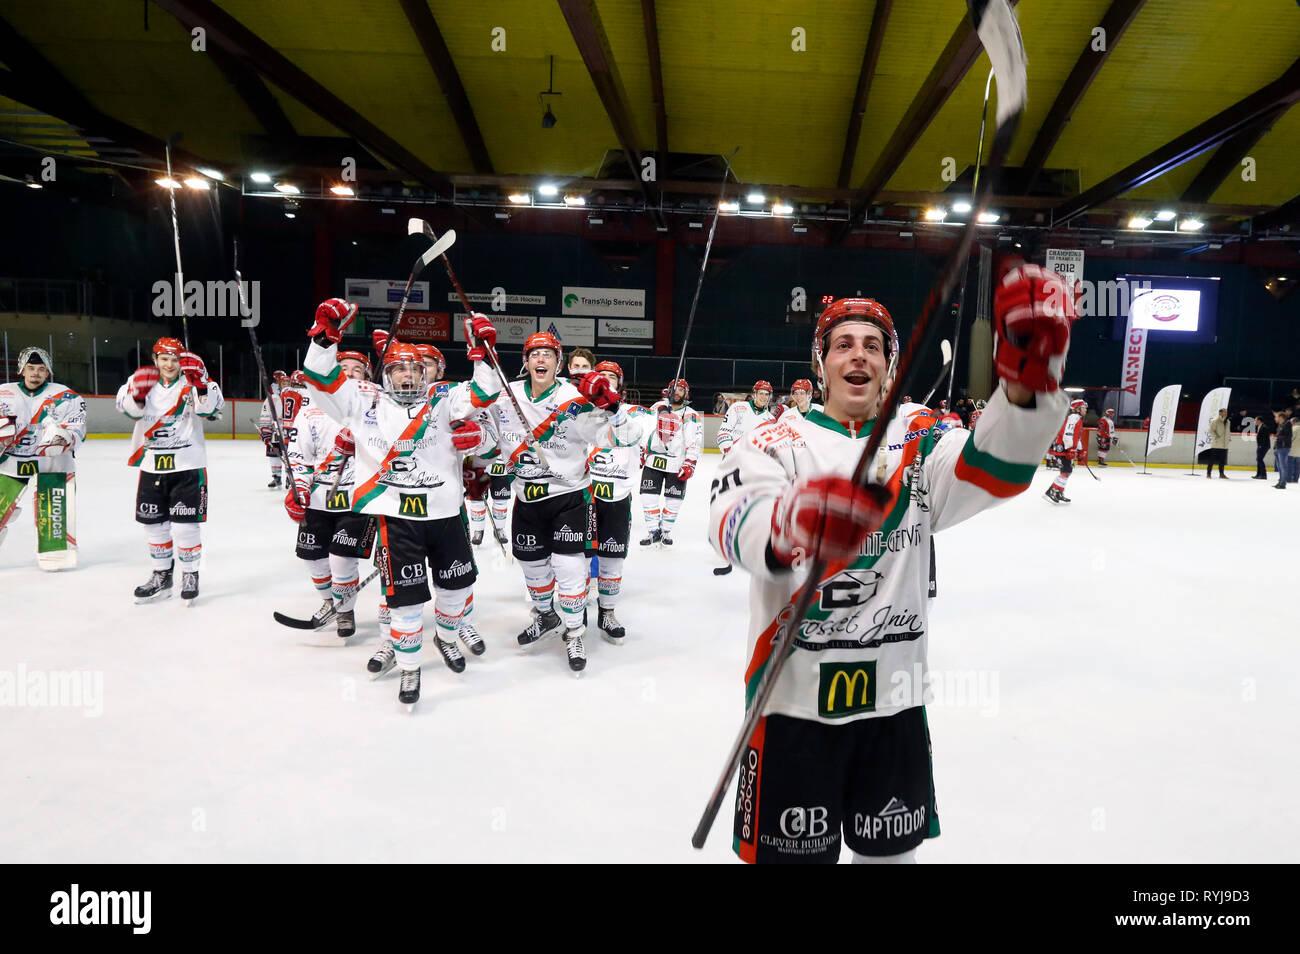 Ice hockey match. HC Mont-Blanc. Victory  celebration. Annecy. France. - Stock Image